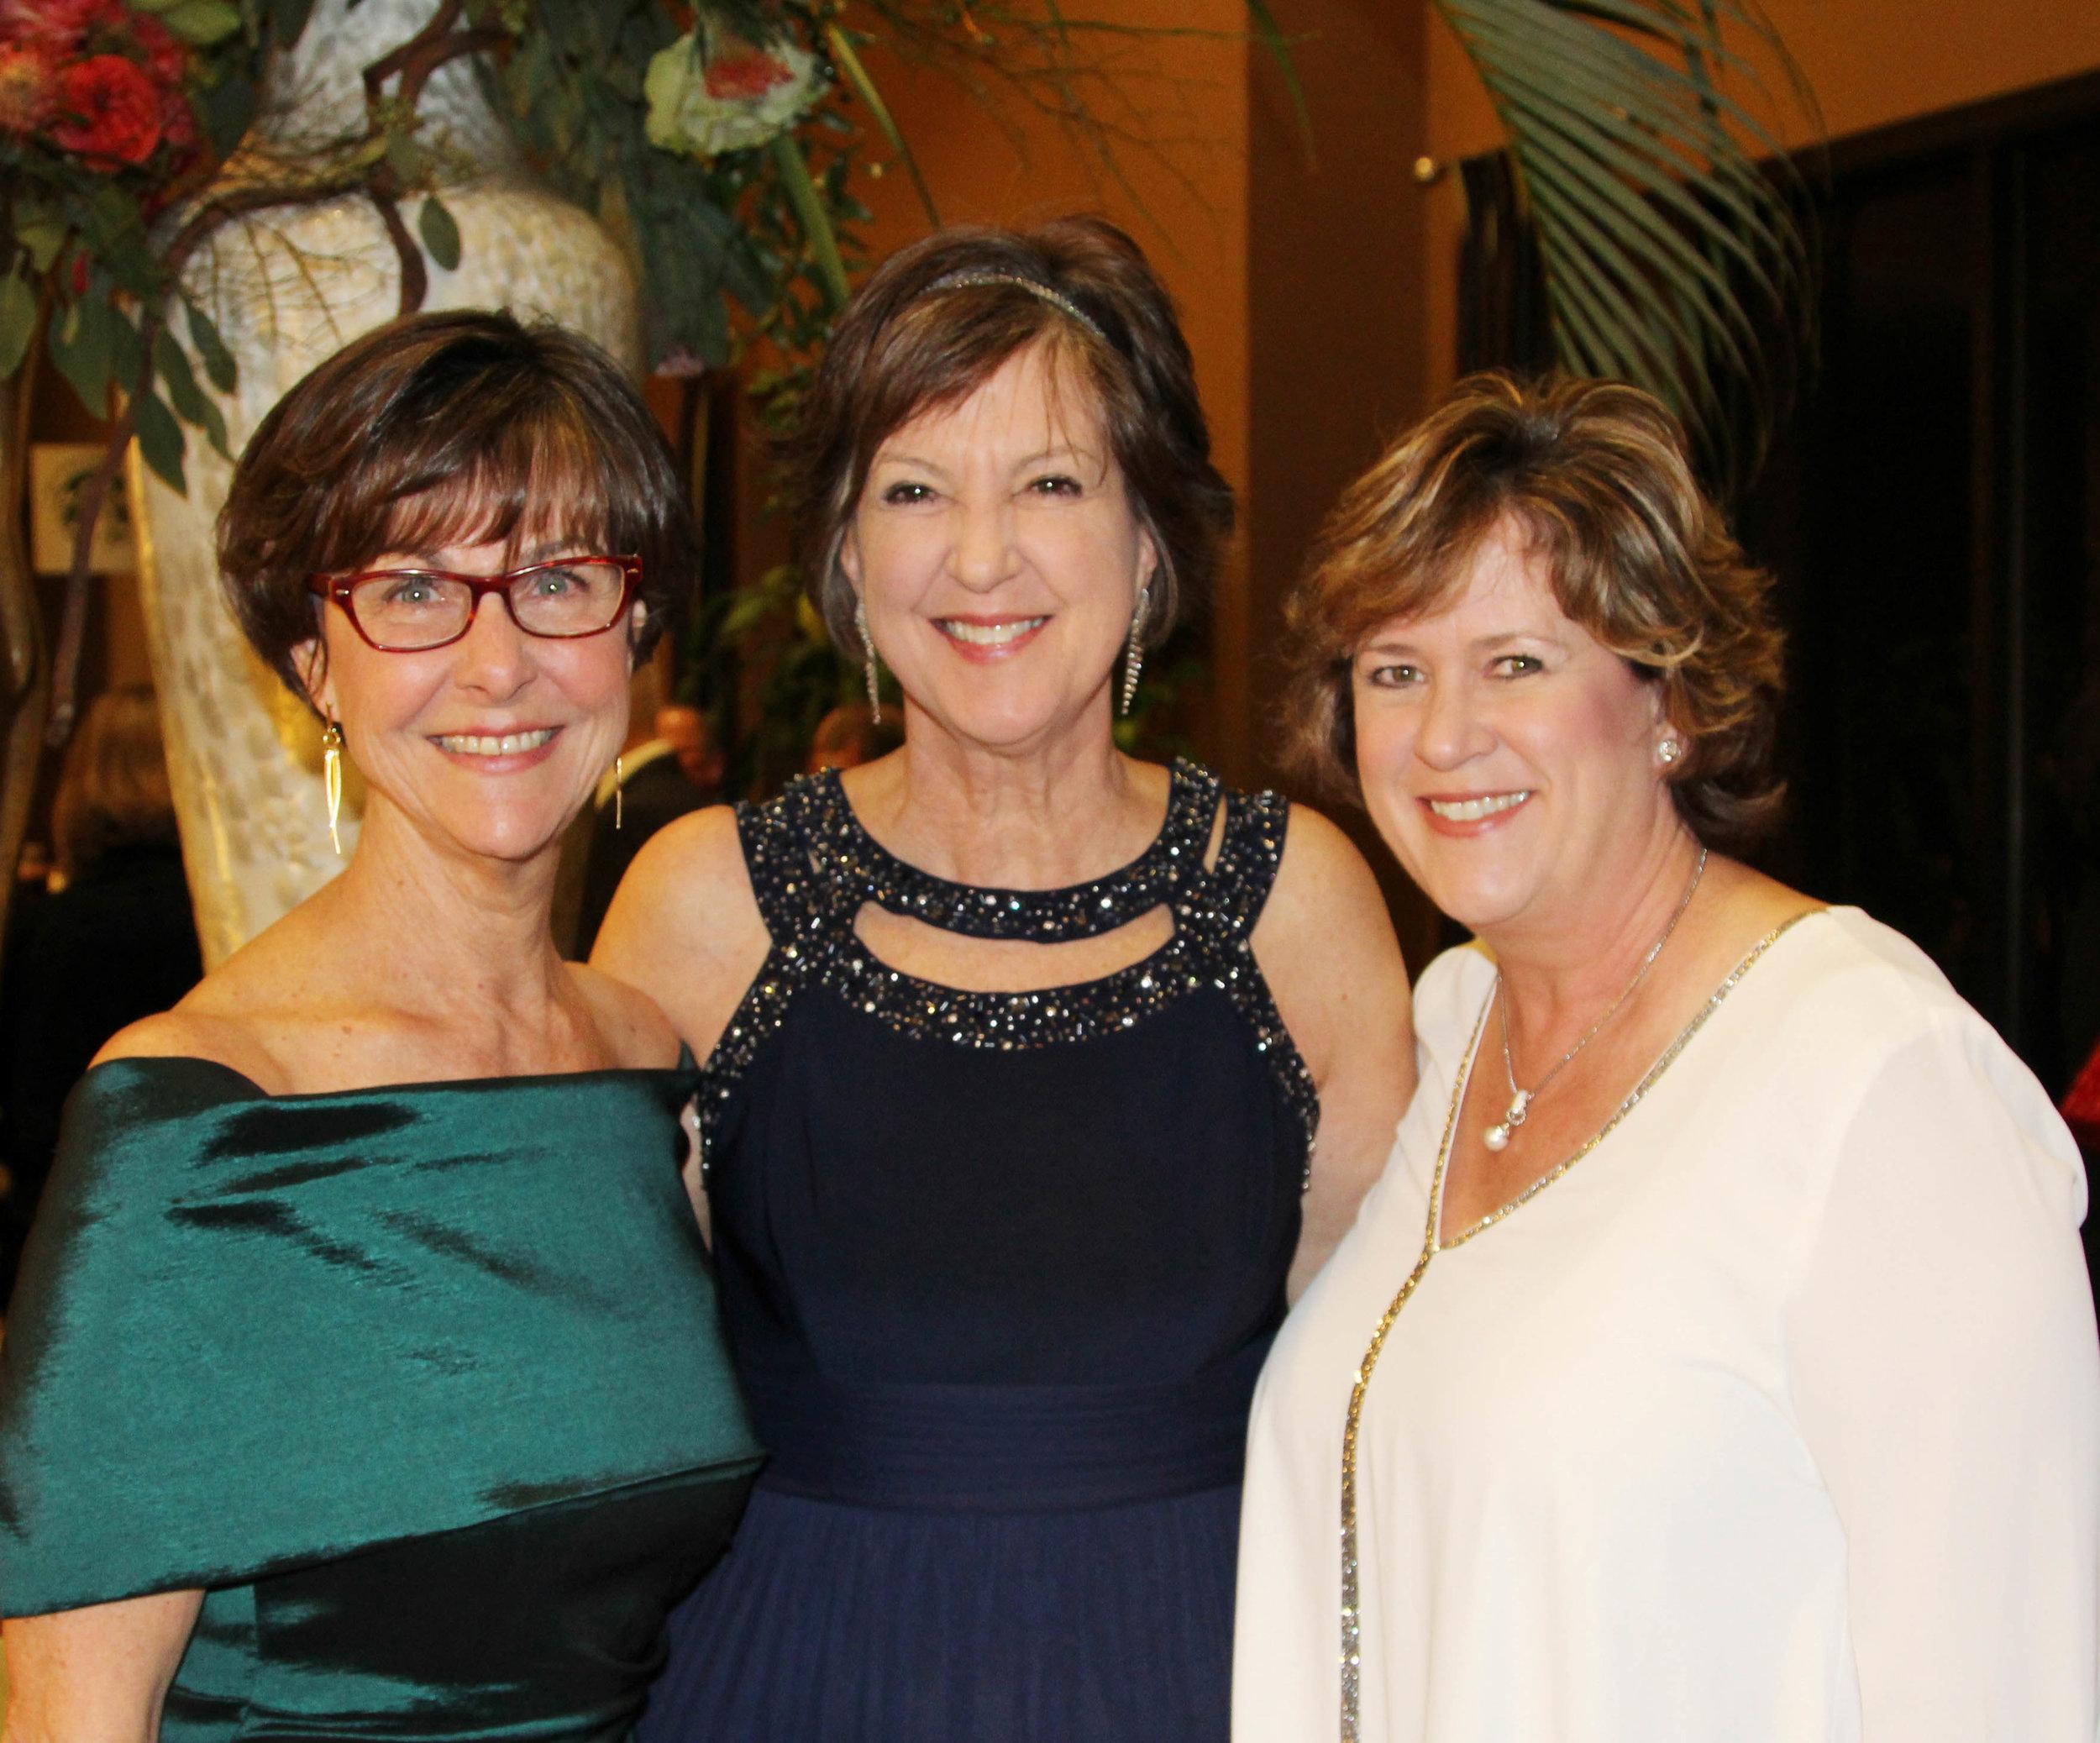 Debbie Alkire, Gail Eichler and Trish Reed